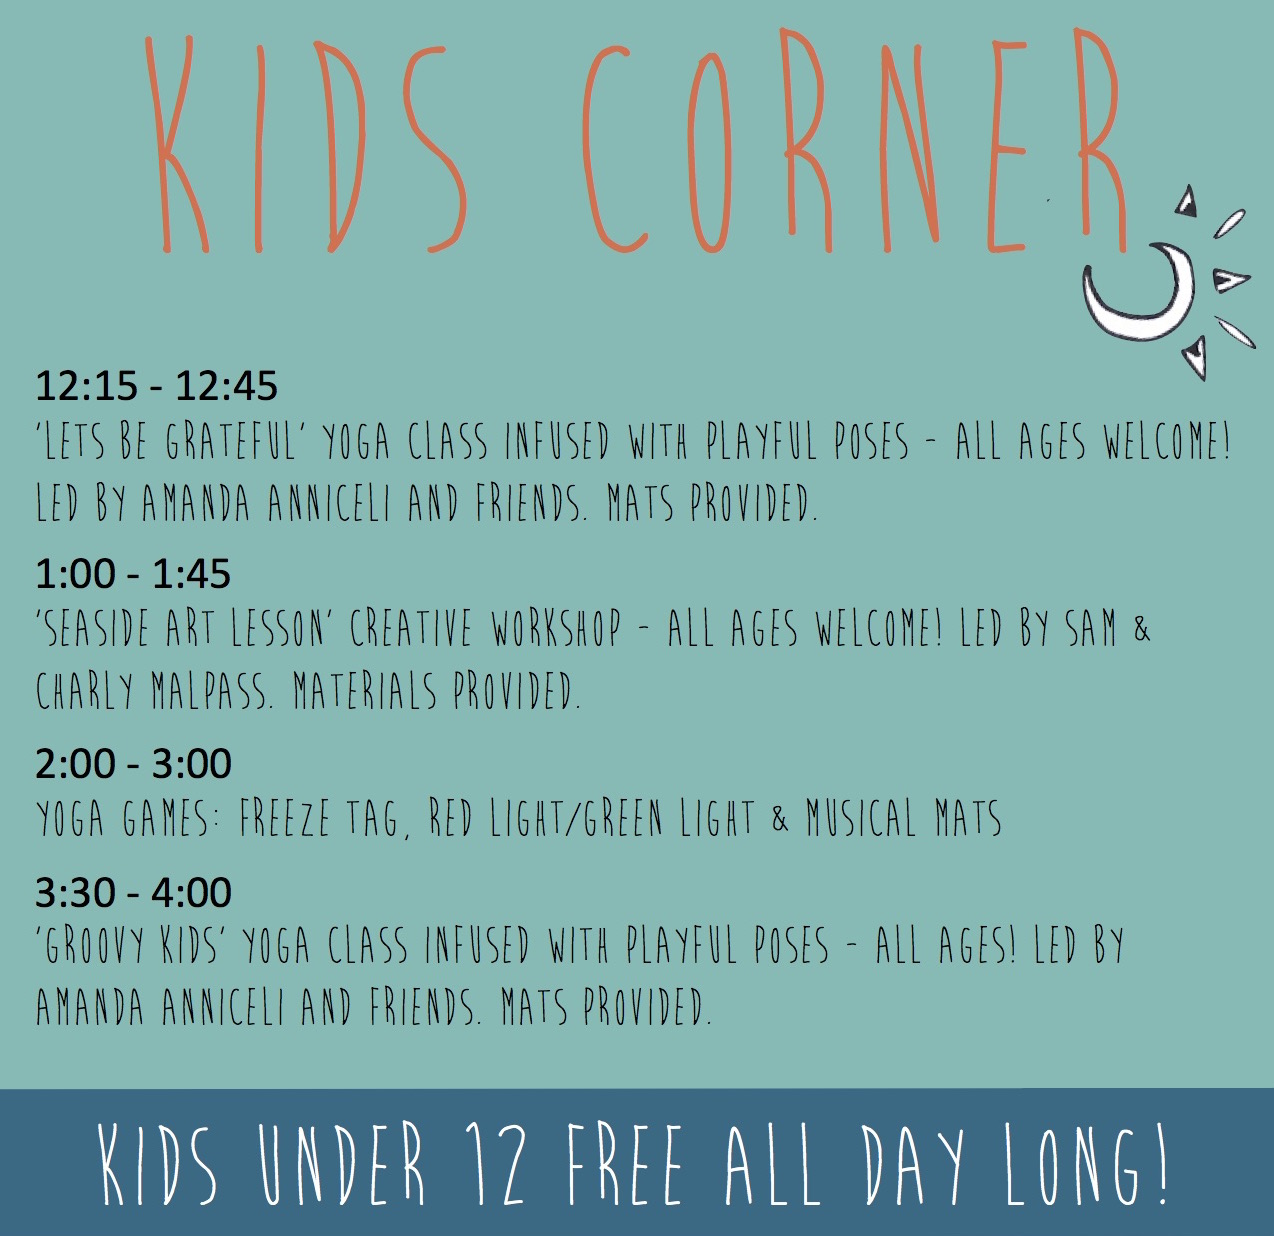 http://www.wildvibes.org/kids-corner/